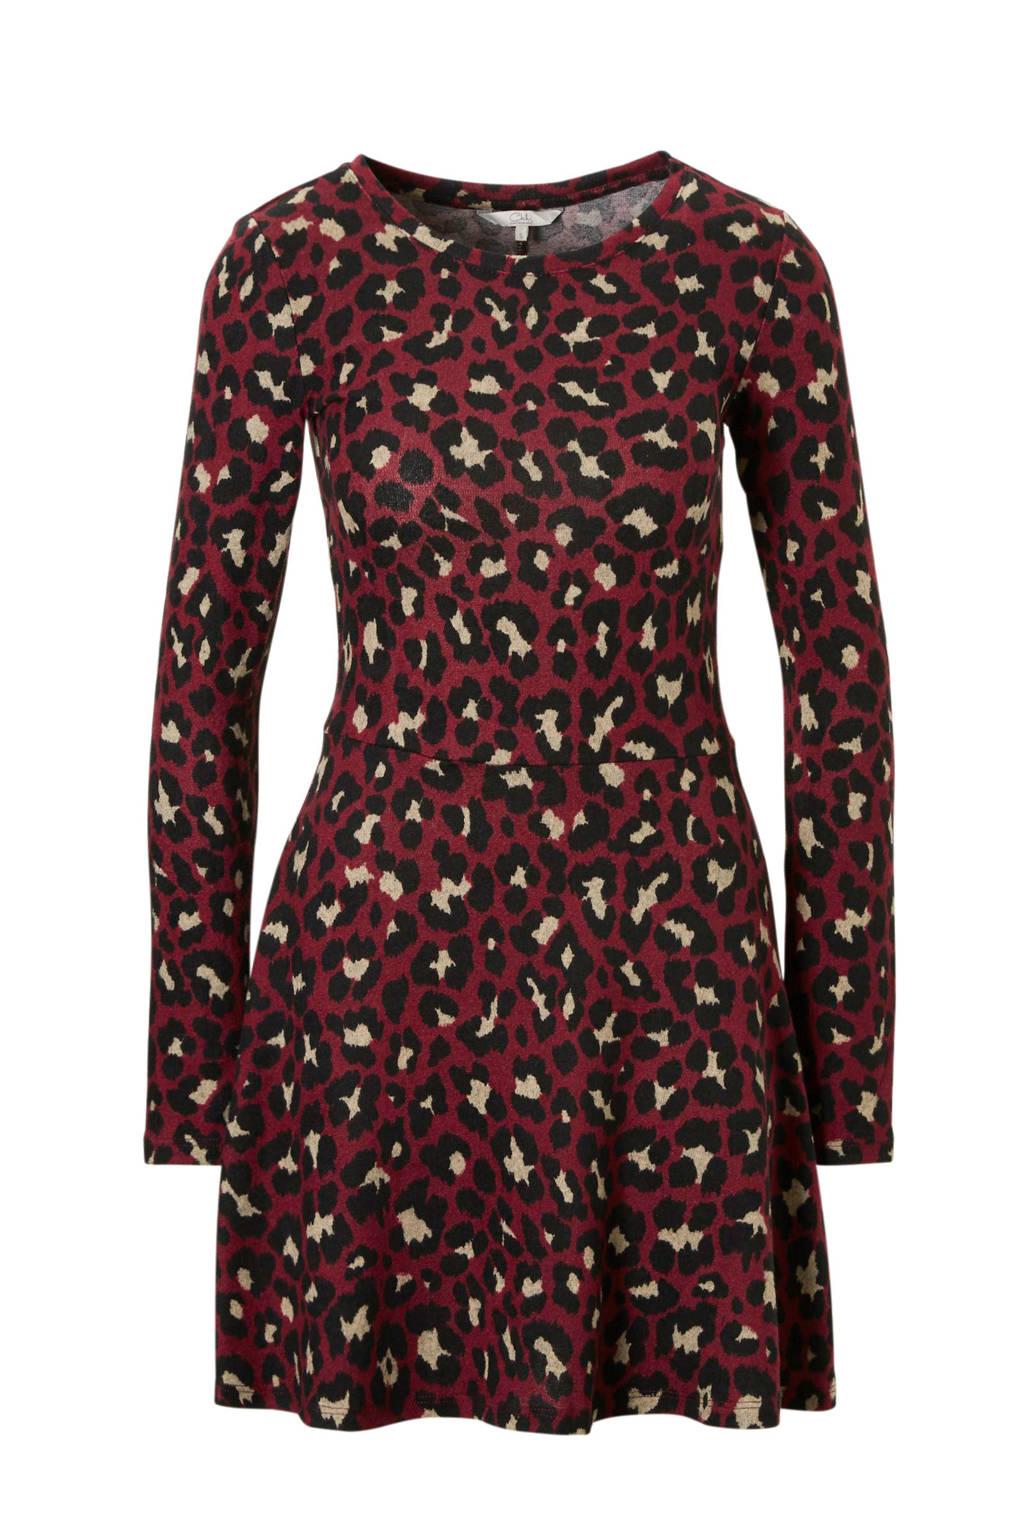 C&A Clockhouse jurk met panterprint donkerrood, Donkerrood